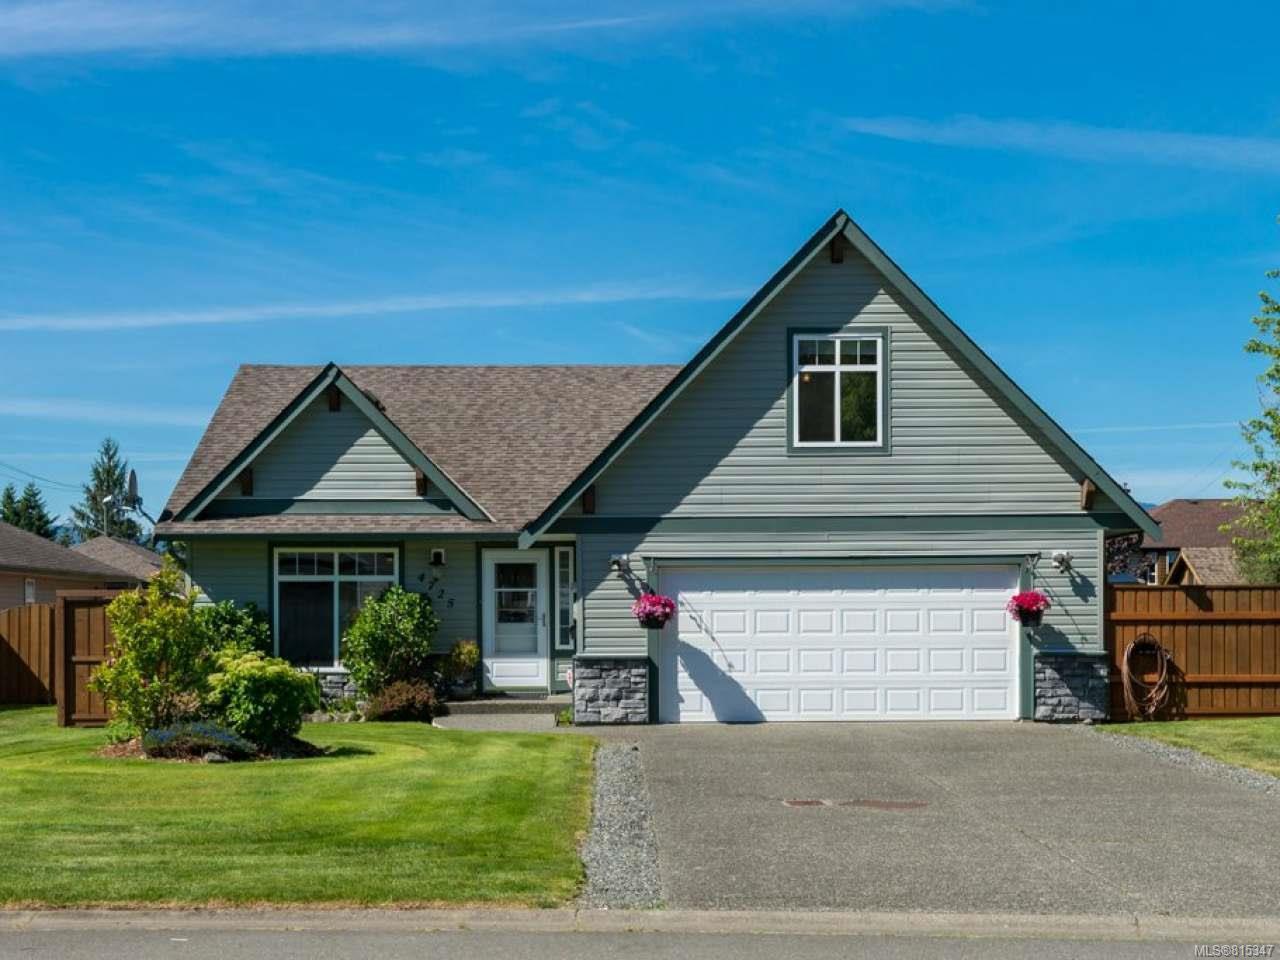 Main Photo: 4725 Cruickshank Pl in COURTENAY: CV Courtenay East House for sale (Comox Valley)  : MLS®# 815347